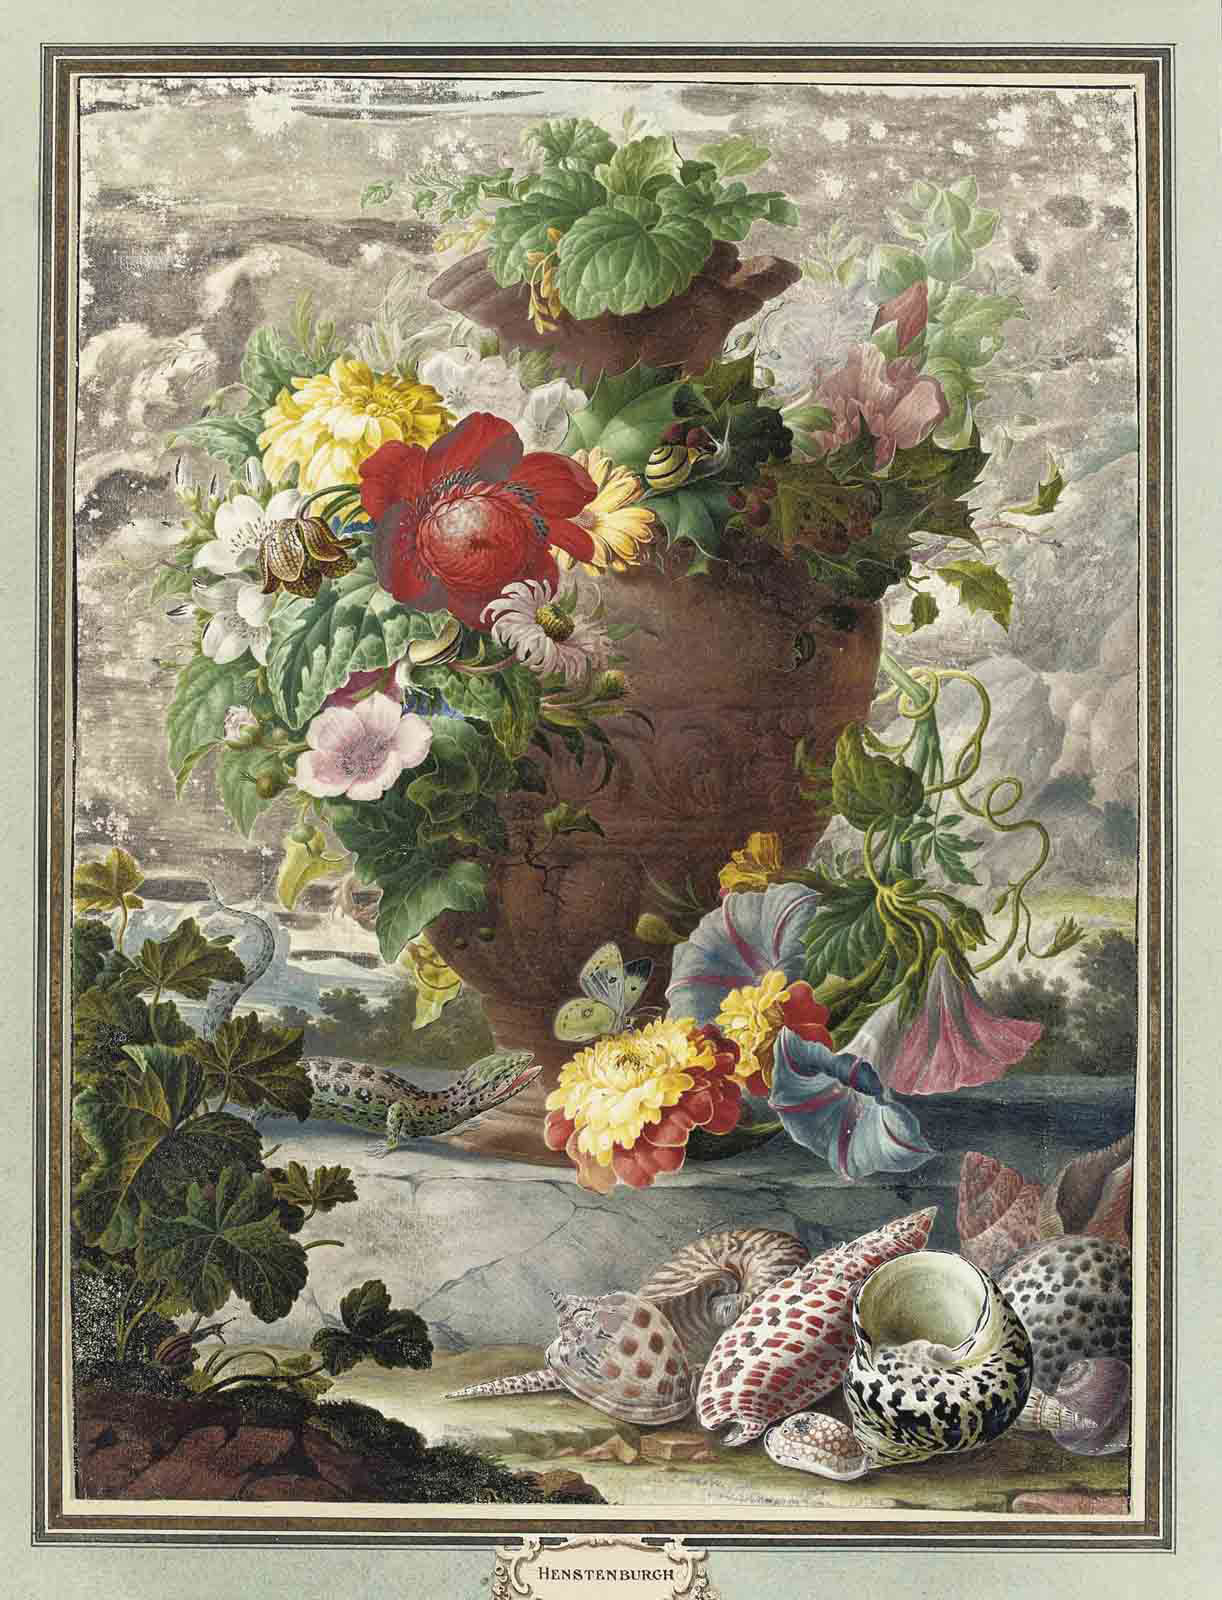 Herman Henstenburgh (Hoorn 166